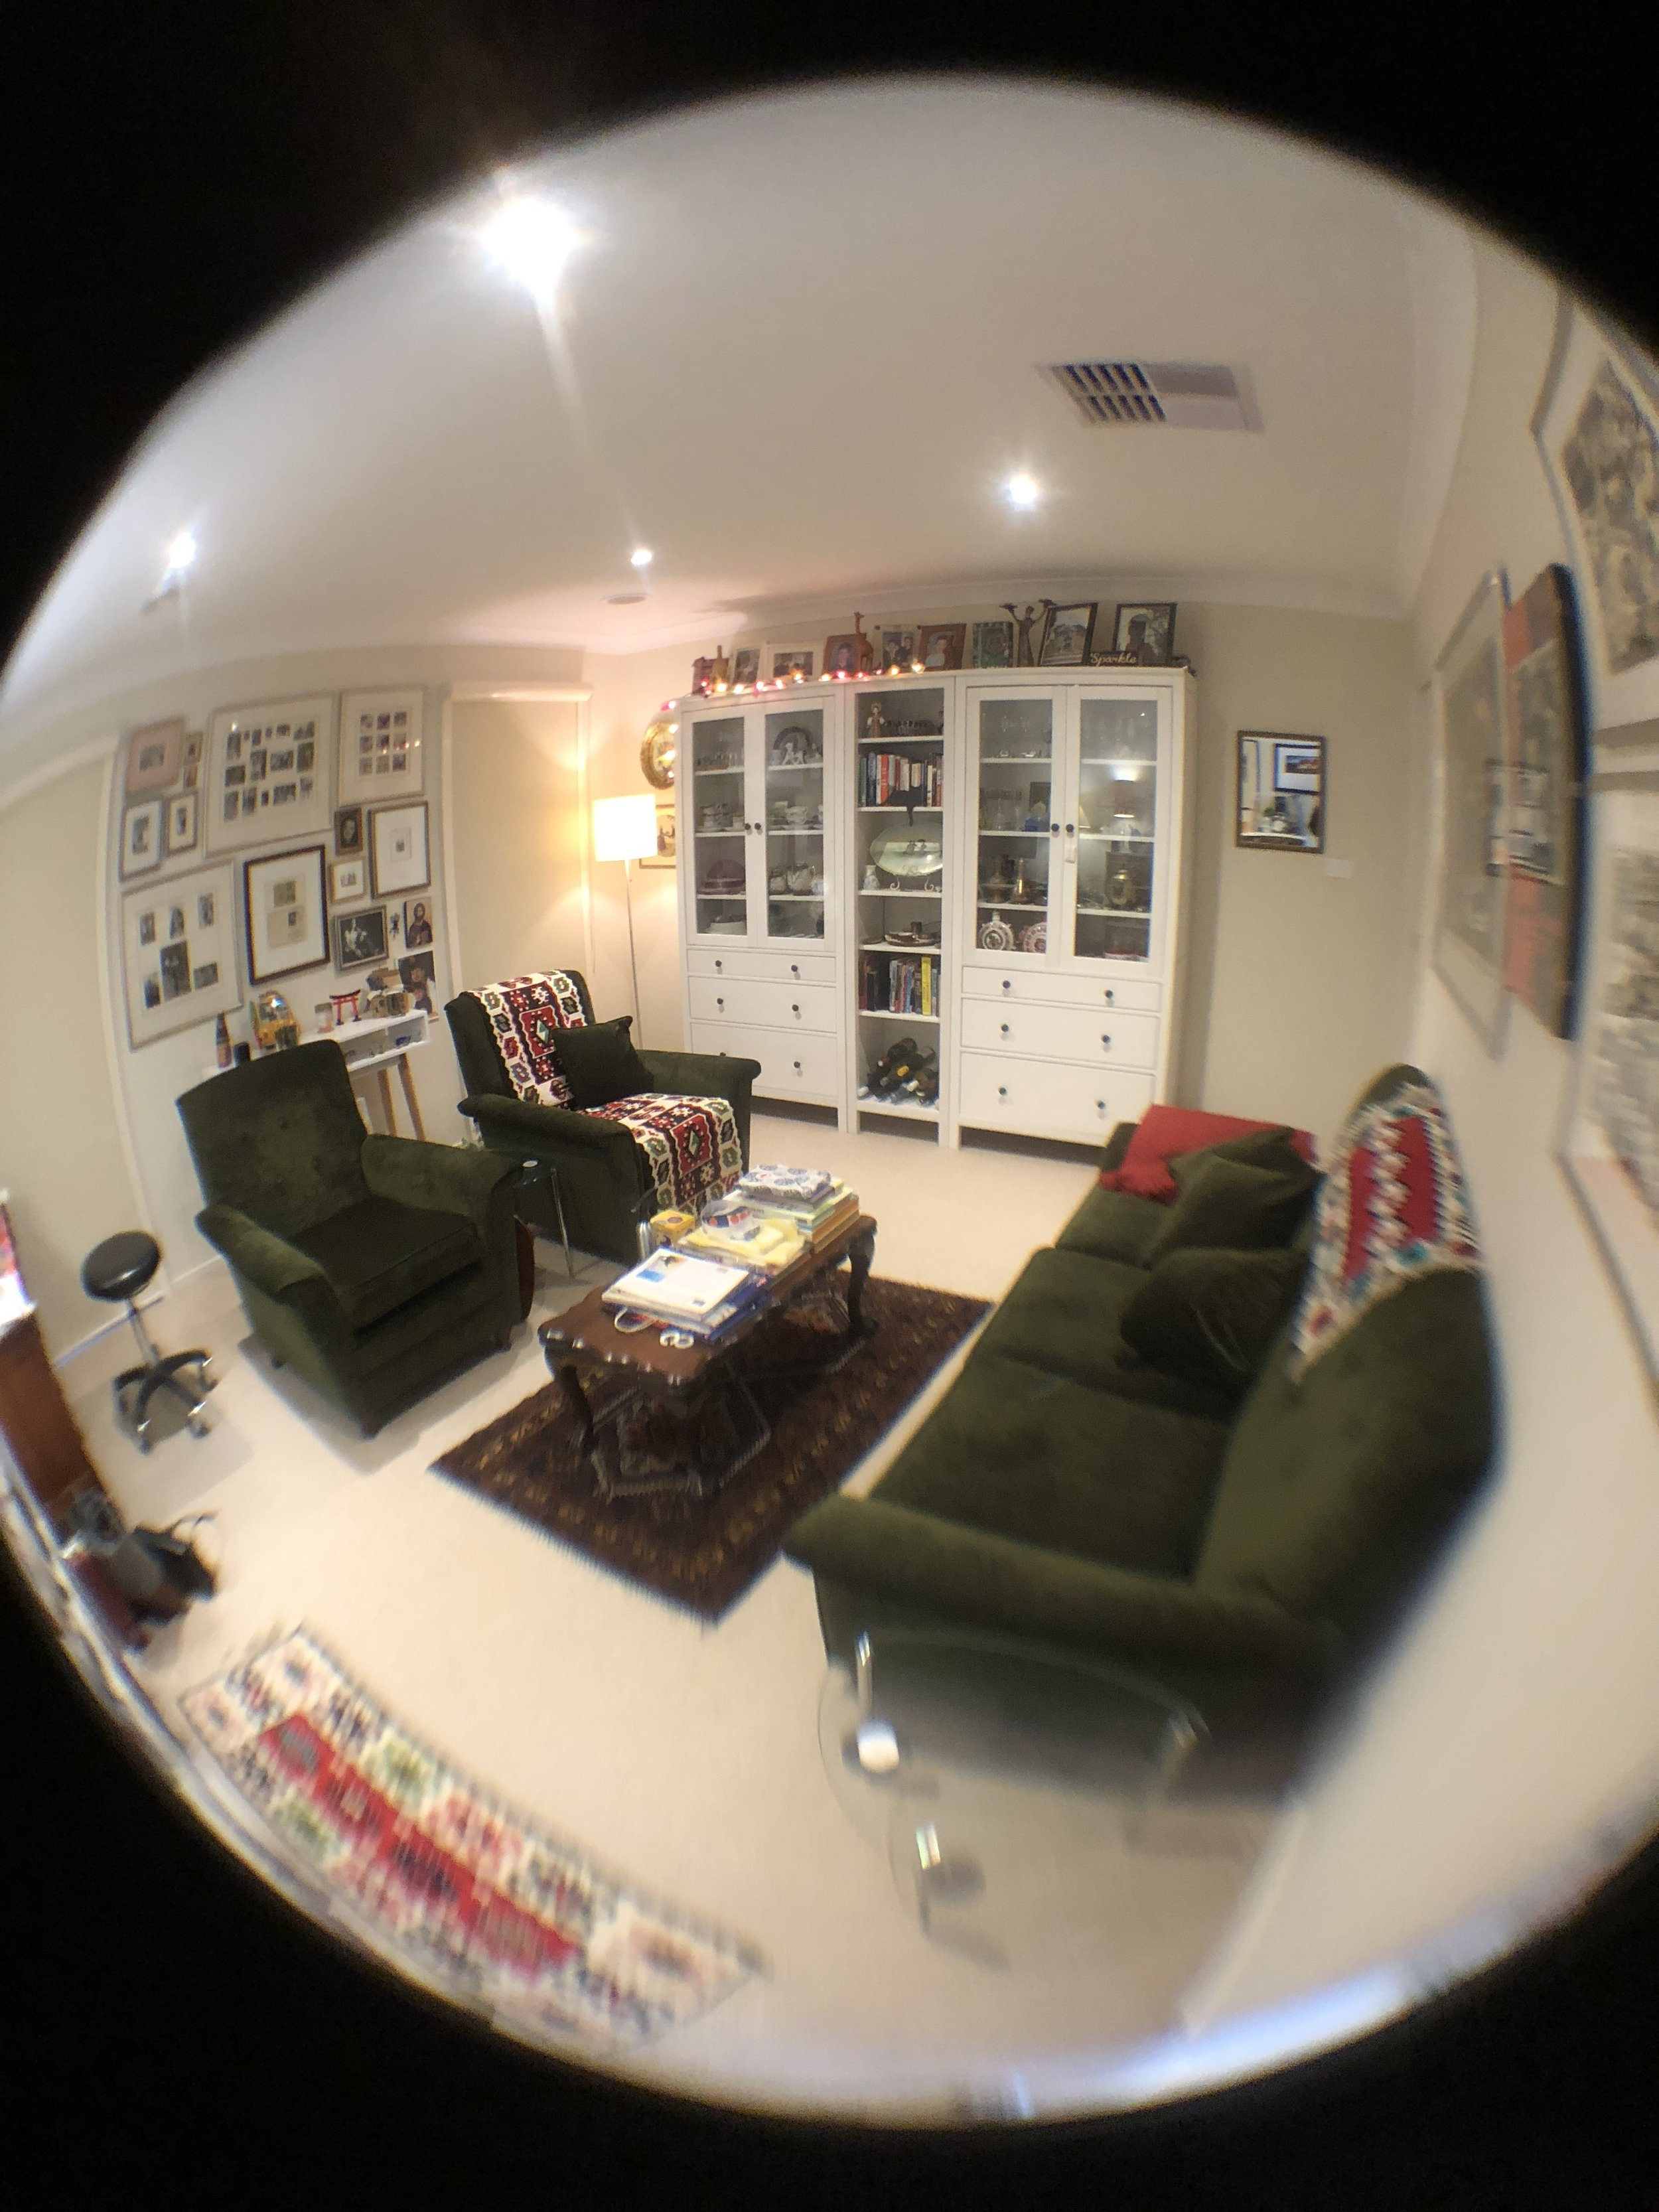 Fish-eye lens photo of studio